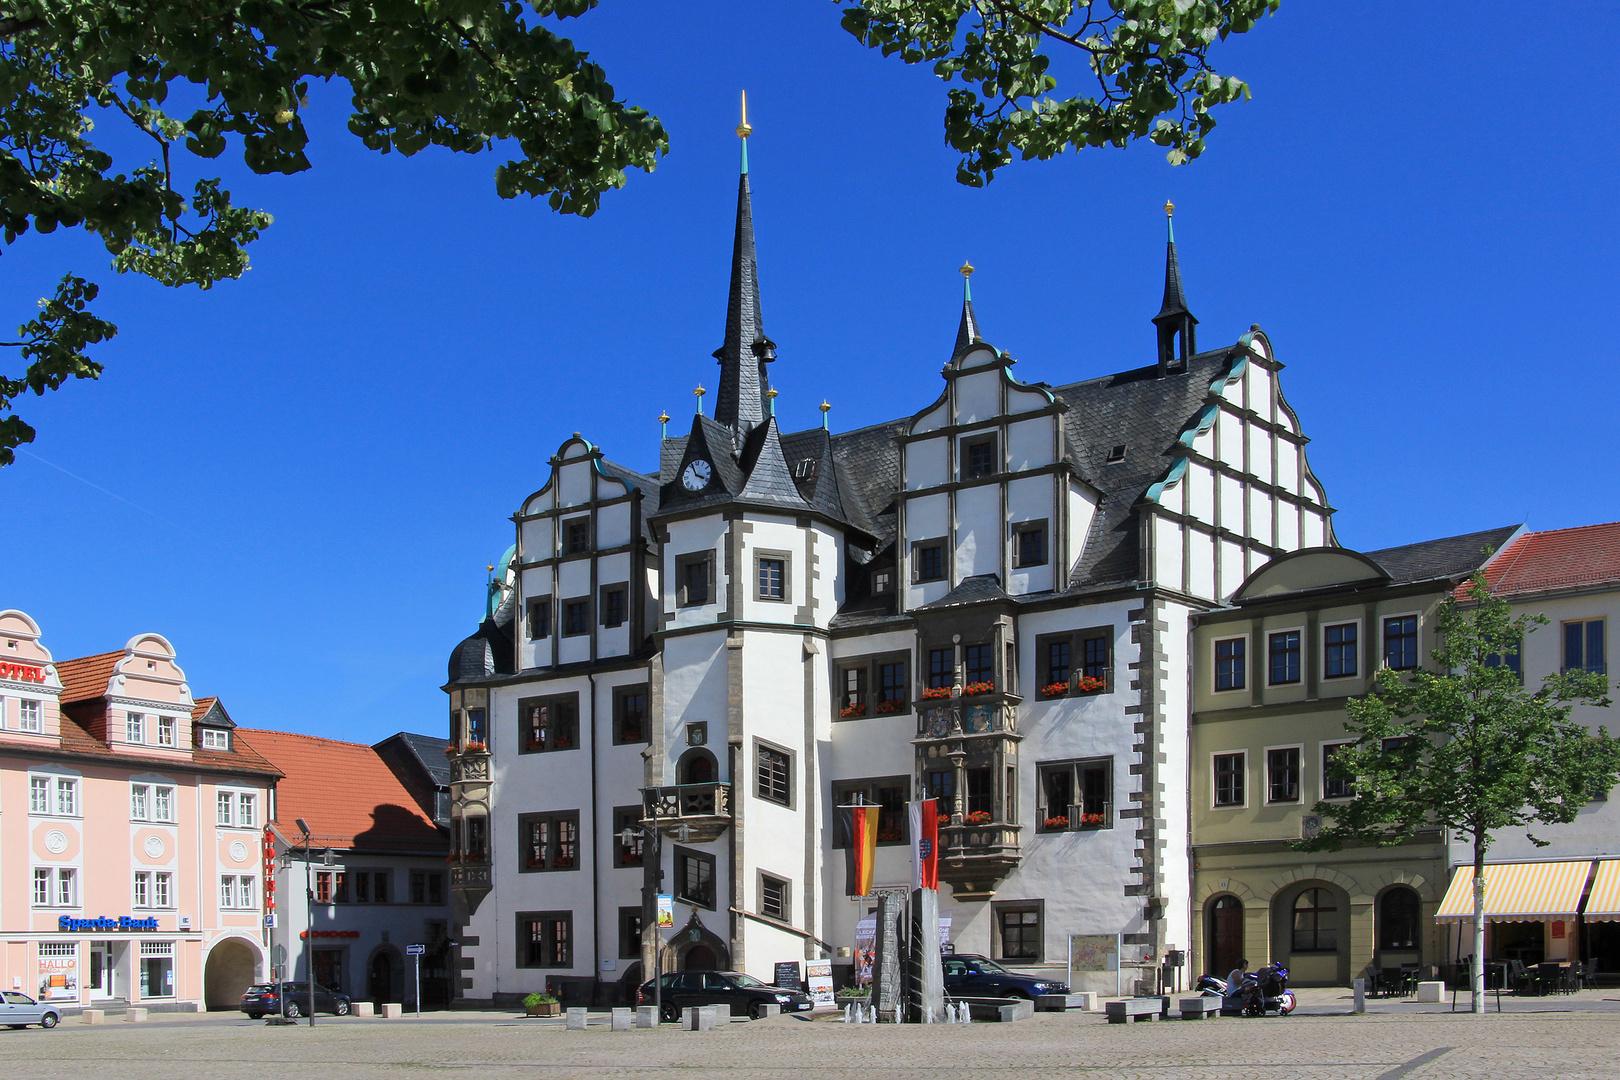 Spaziergang in Saalfeld (05) - Rathaus